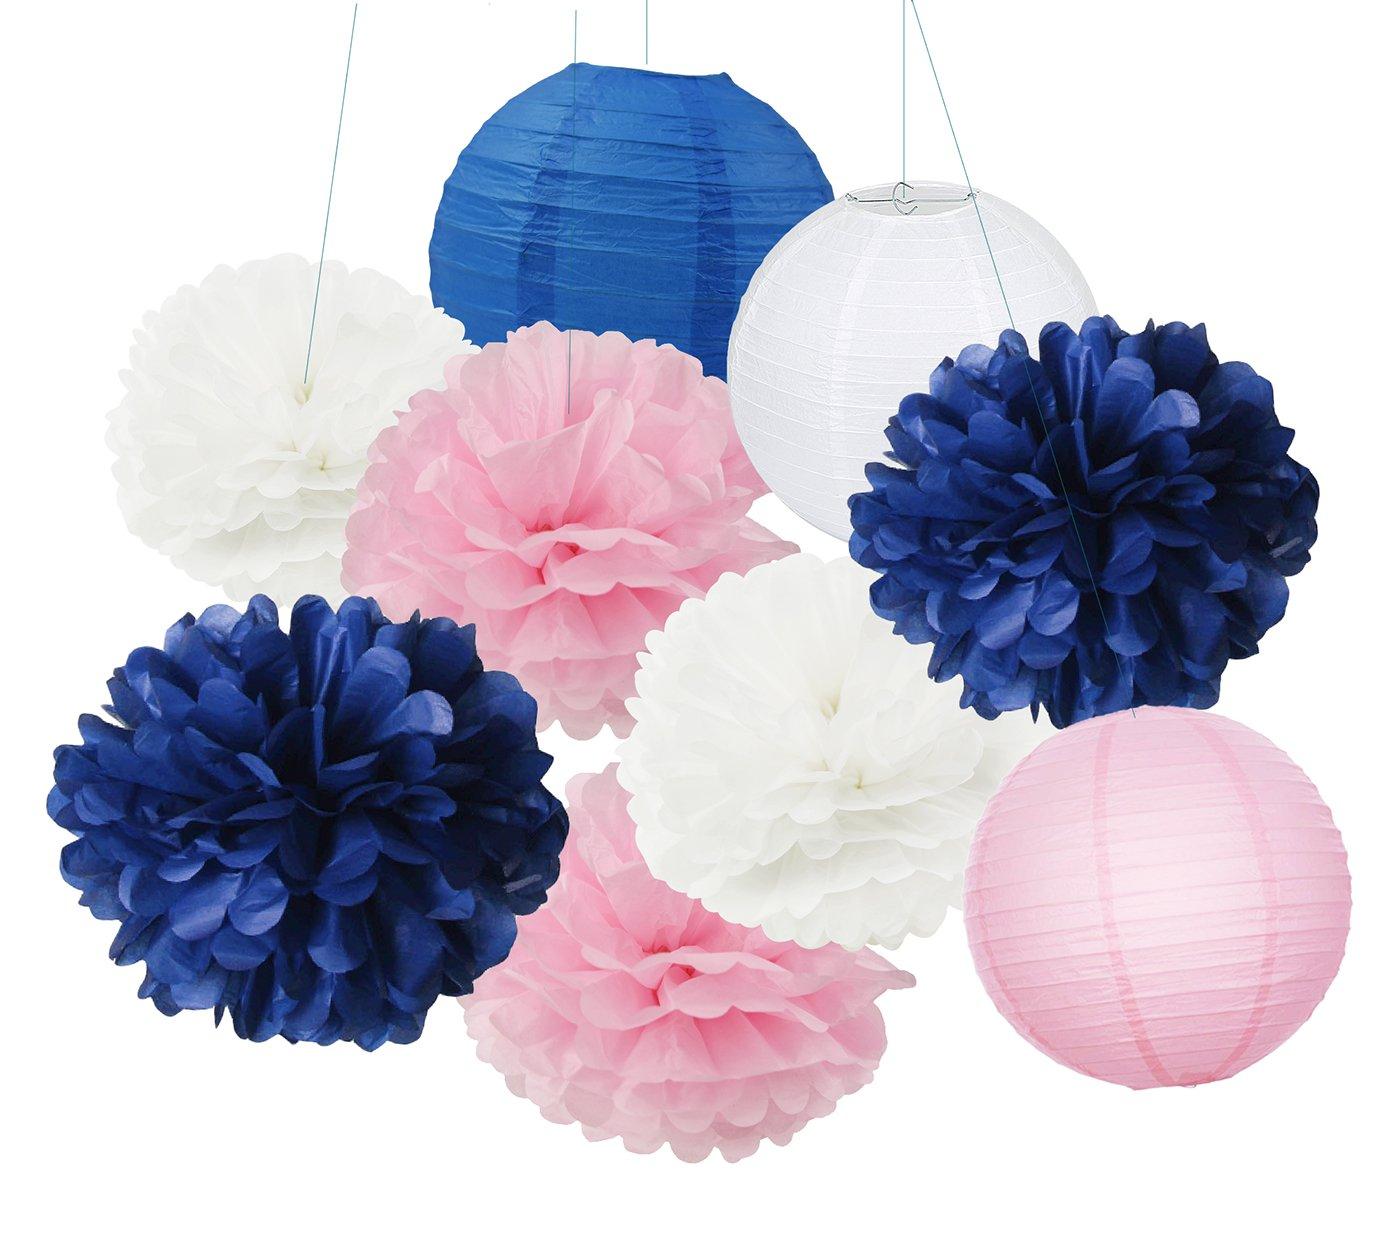 Amazon.com: Furuix 9 pcs White Navy Pink 10inch Tissue Paper Pom Pom ...